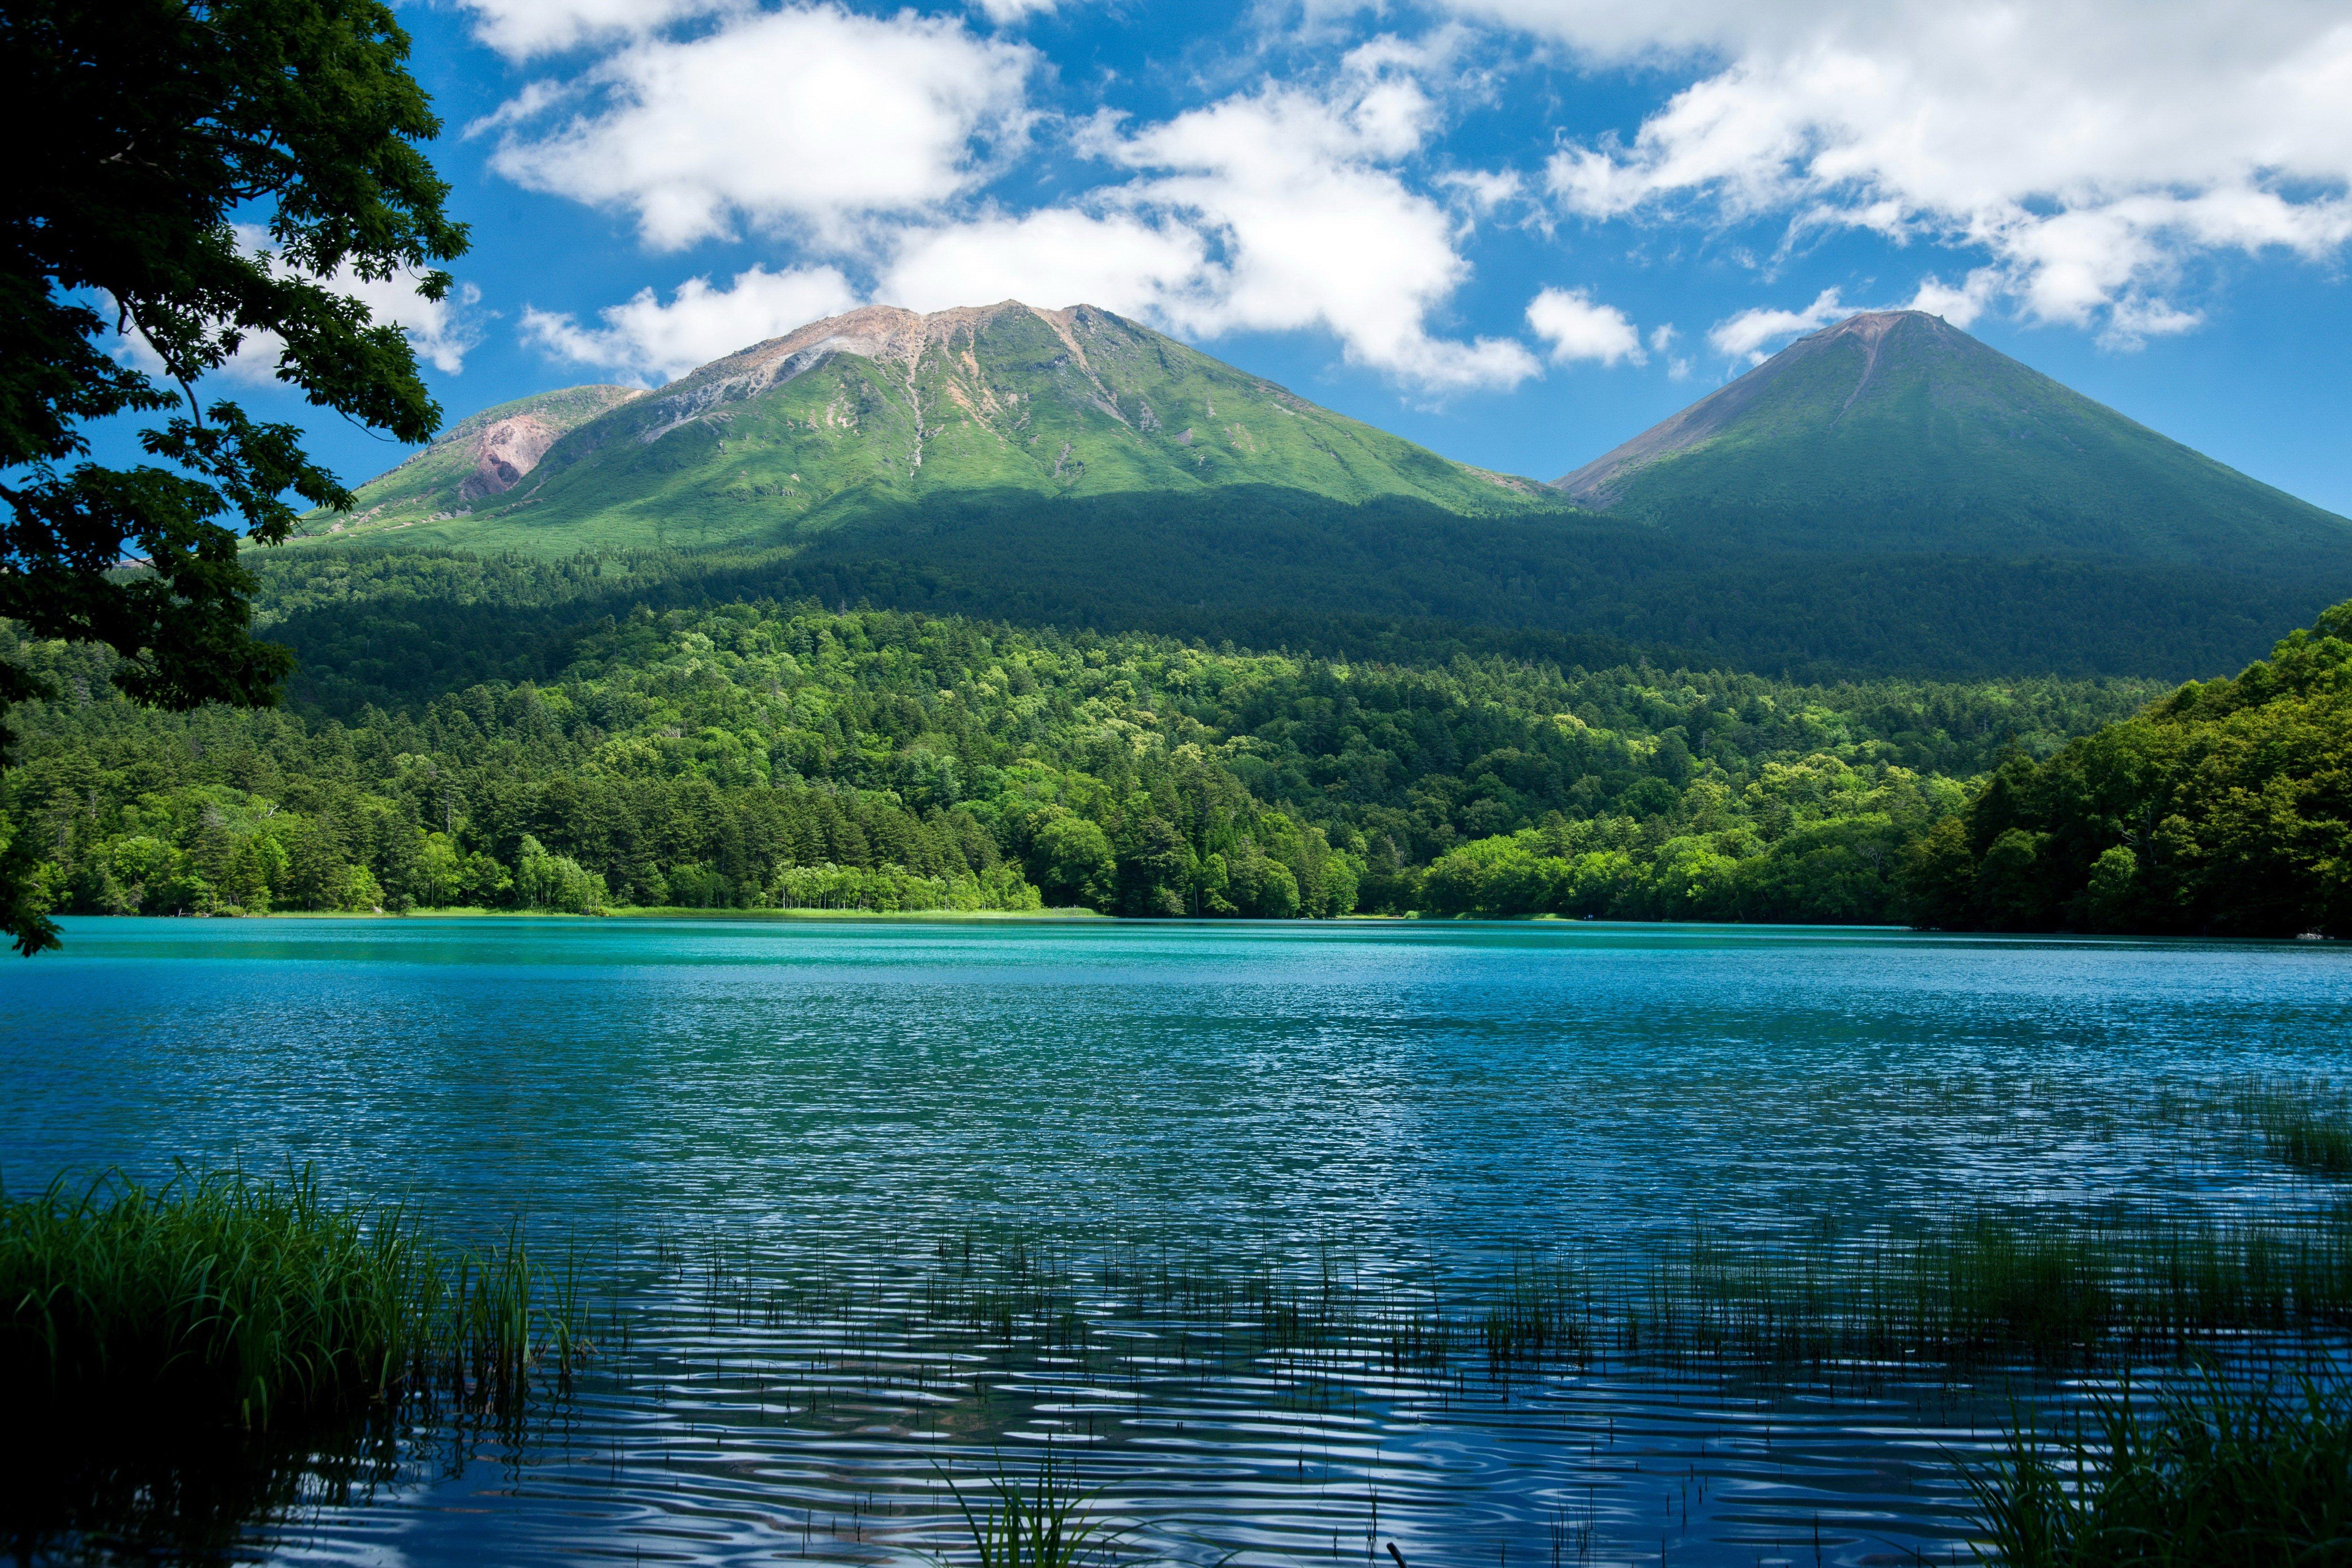 wallpaper amazing mountain lake - photo #19